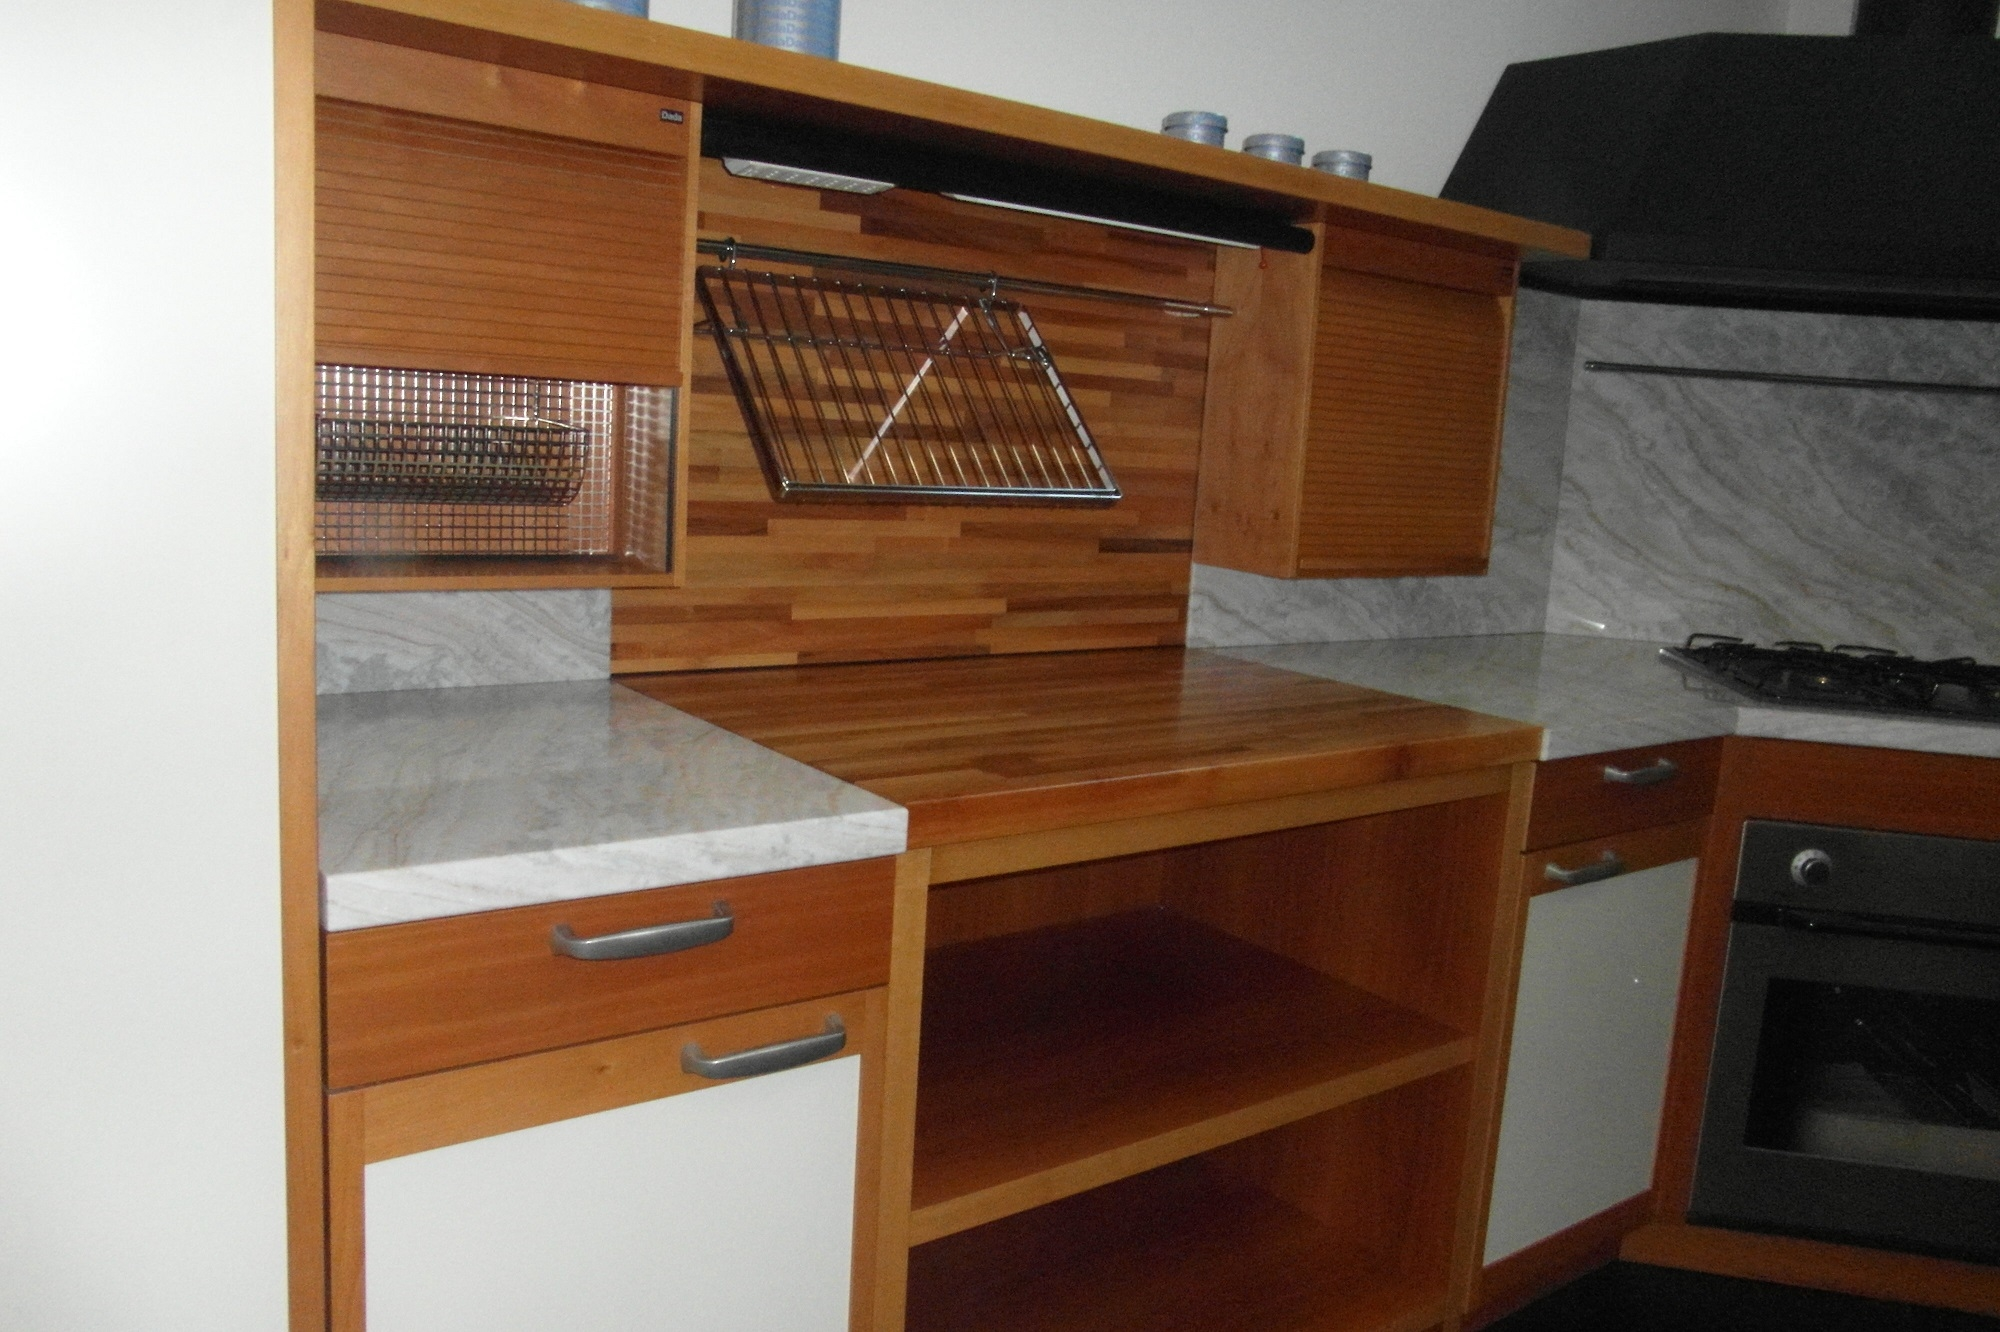 Cucina dada in noce schienale e top in marmo karibib - Prezzi top cucine ...